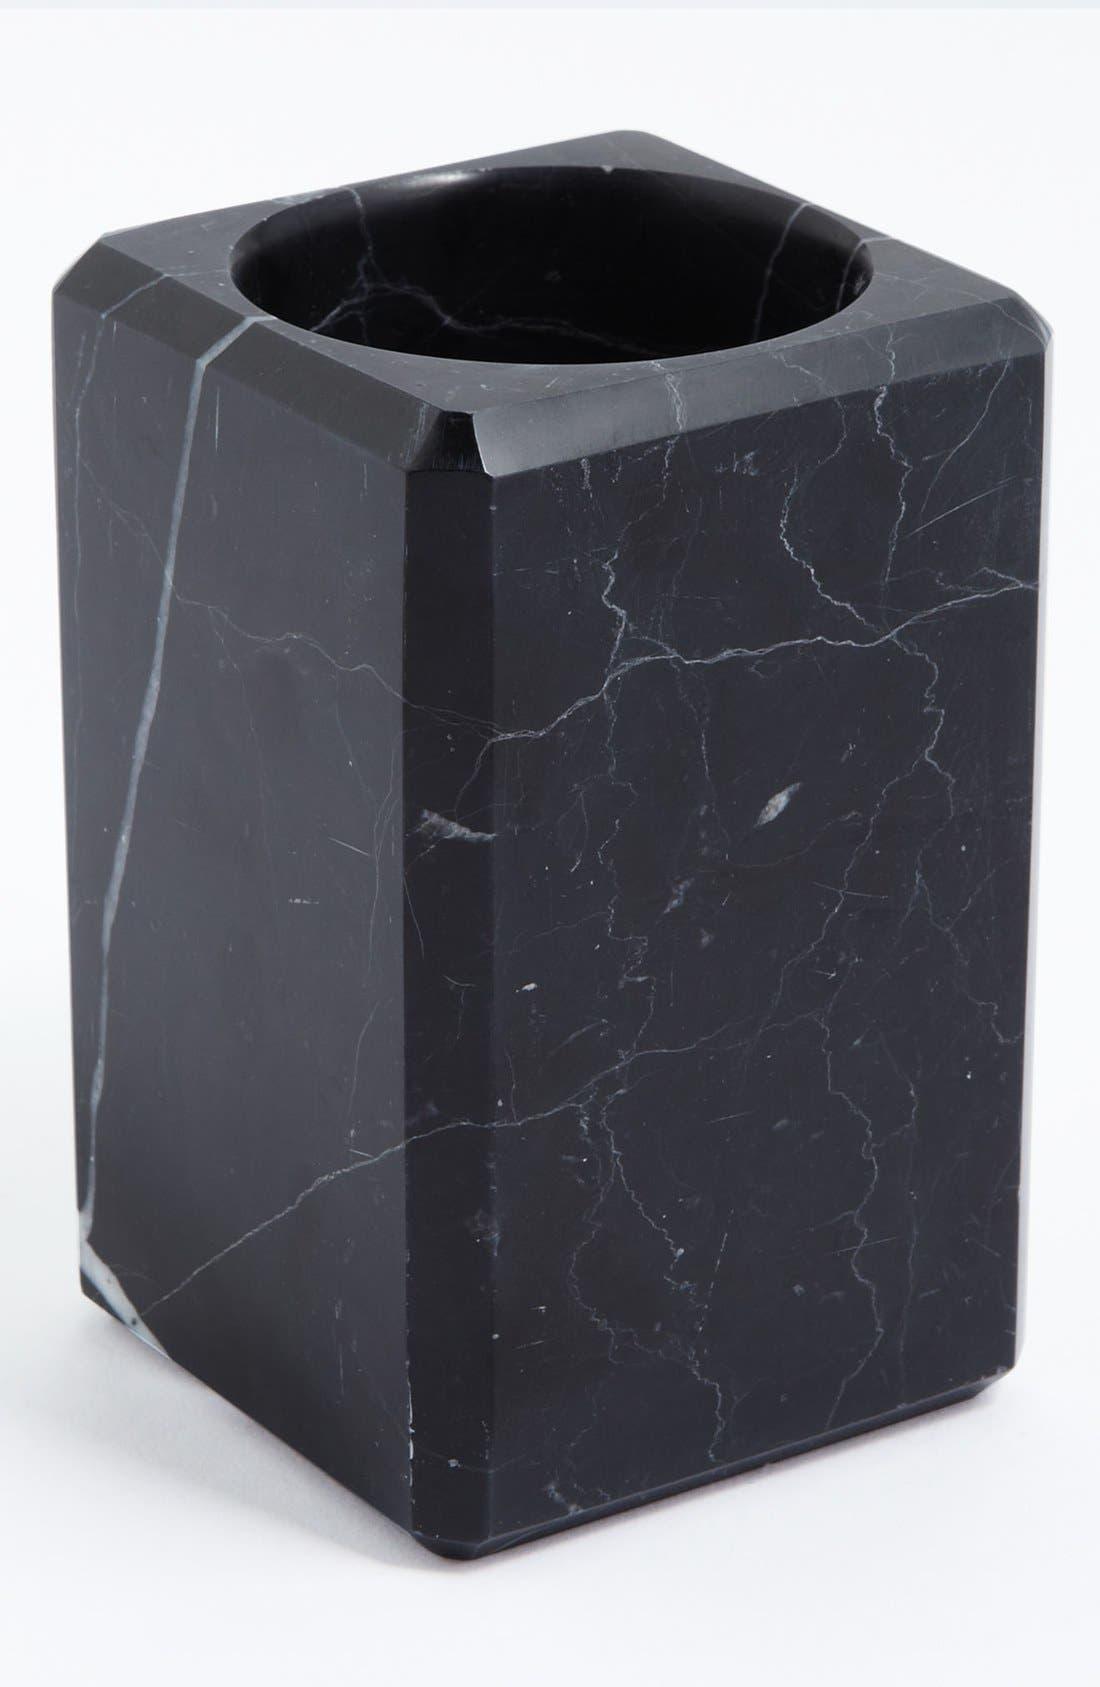 Alternate Image 1 Selected - Waterworks Studio 'Luna' Black Marble Tumbler (Online Only)